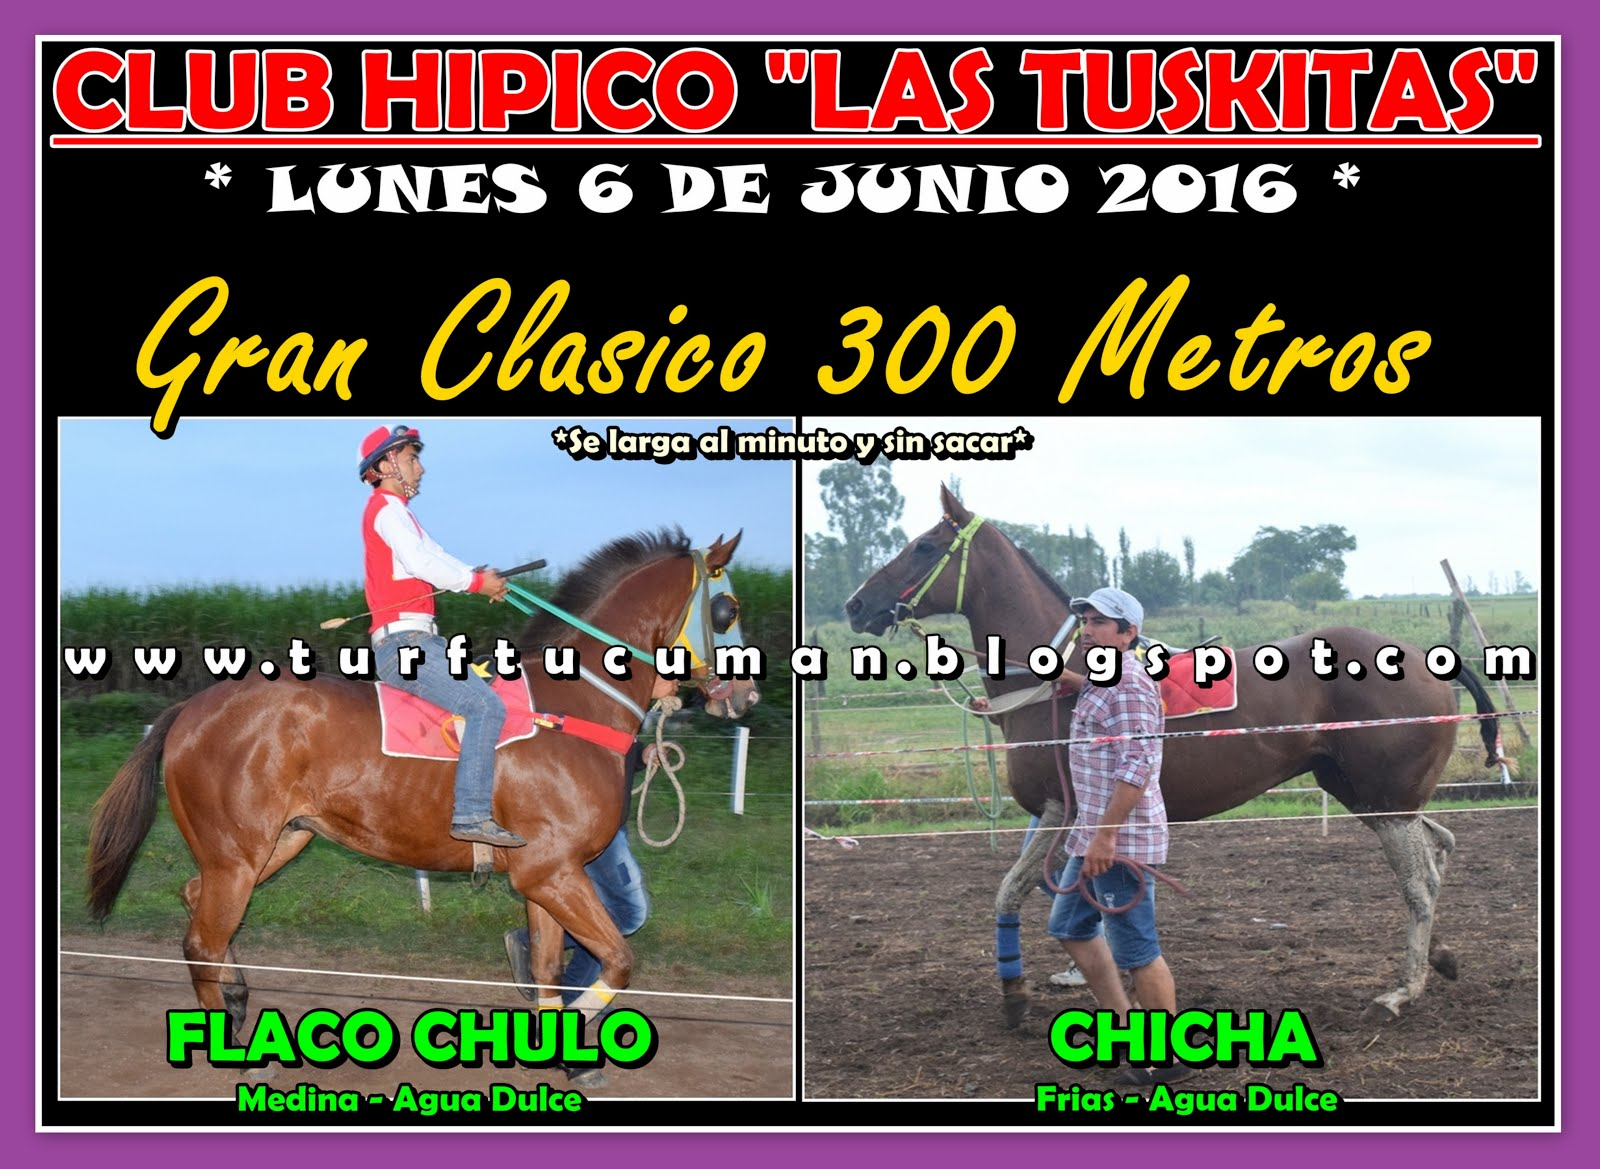 FLACO CHULO VS CHICHA